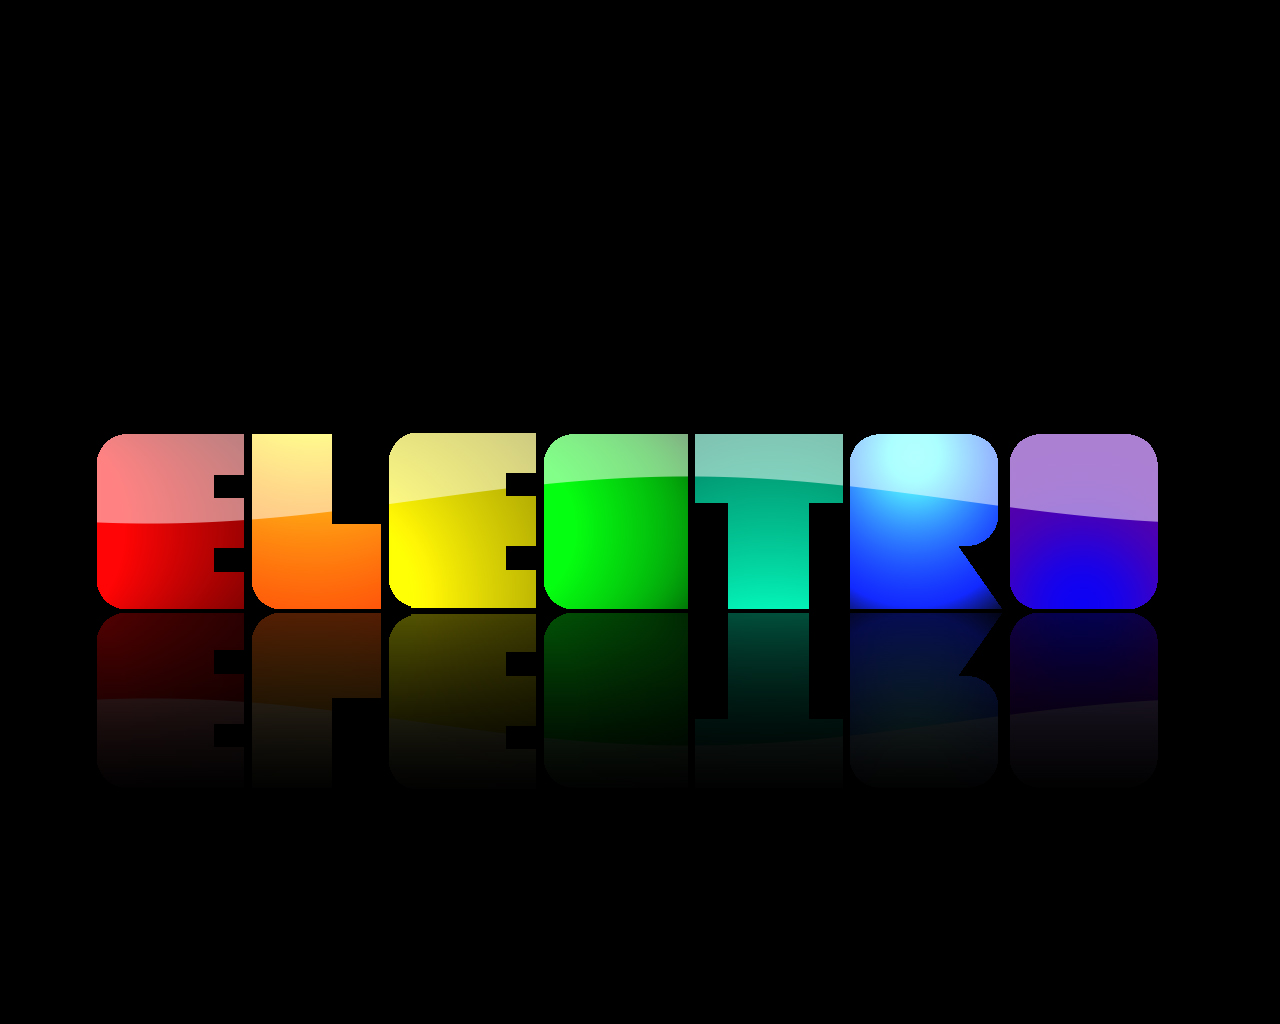 http://4.bp.blogspot.com/-49xB__skT4k/T1CaNDfWMLI/AAAAAAAAArI/JNzqyLdwCUg/s1600/electro1.jpg